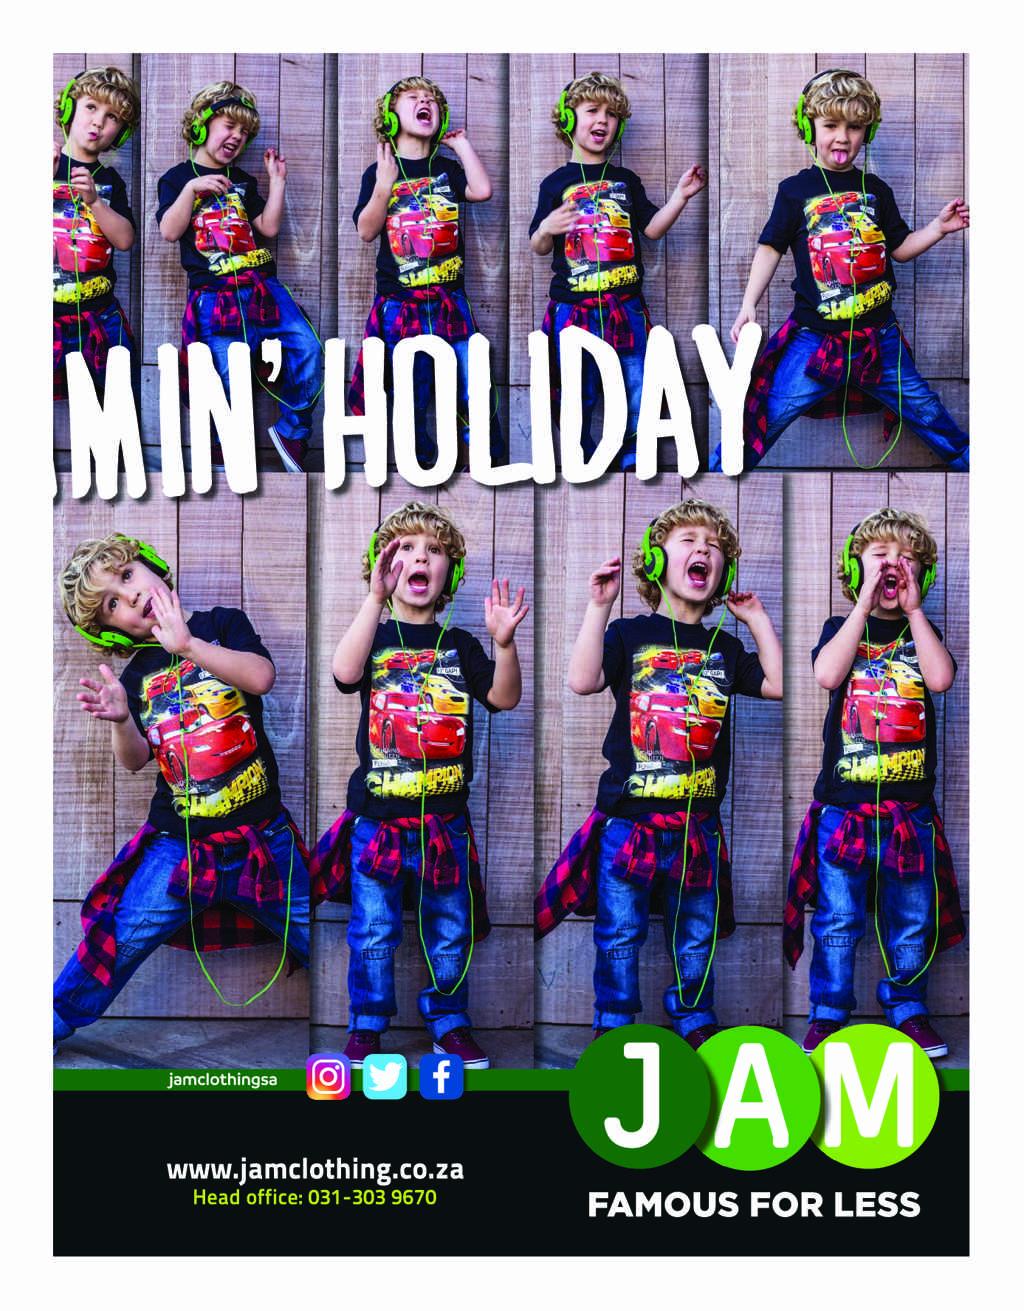 get-it-joburg-west-dec-2016-jan-2017-epapers-page-23